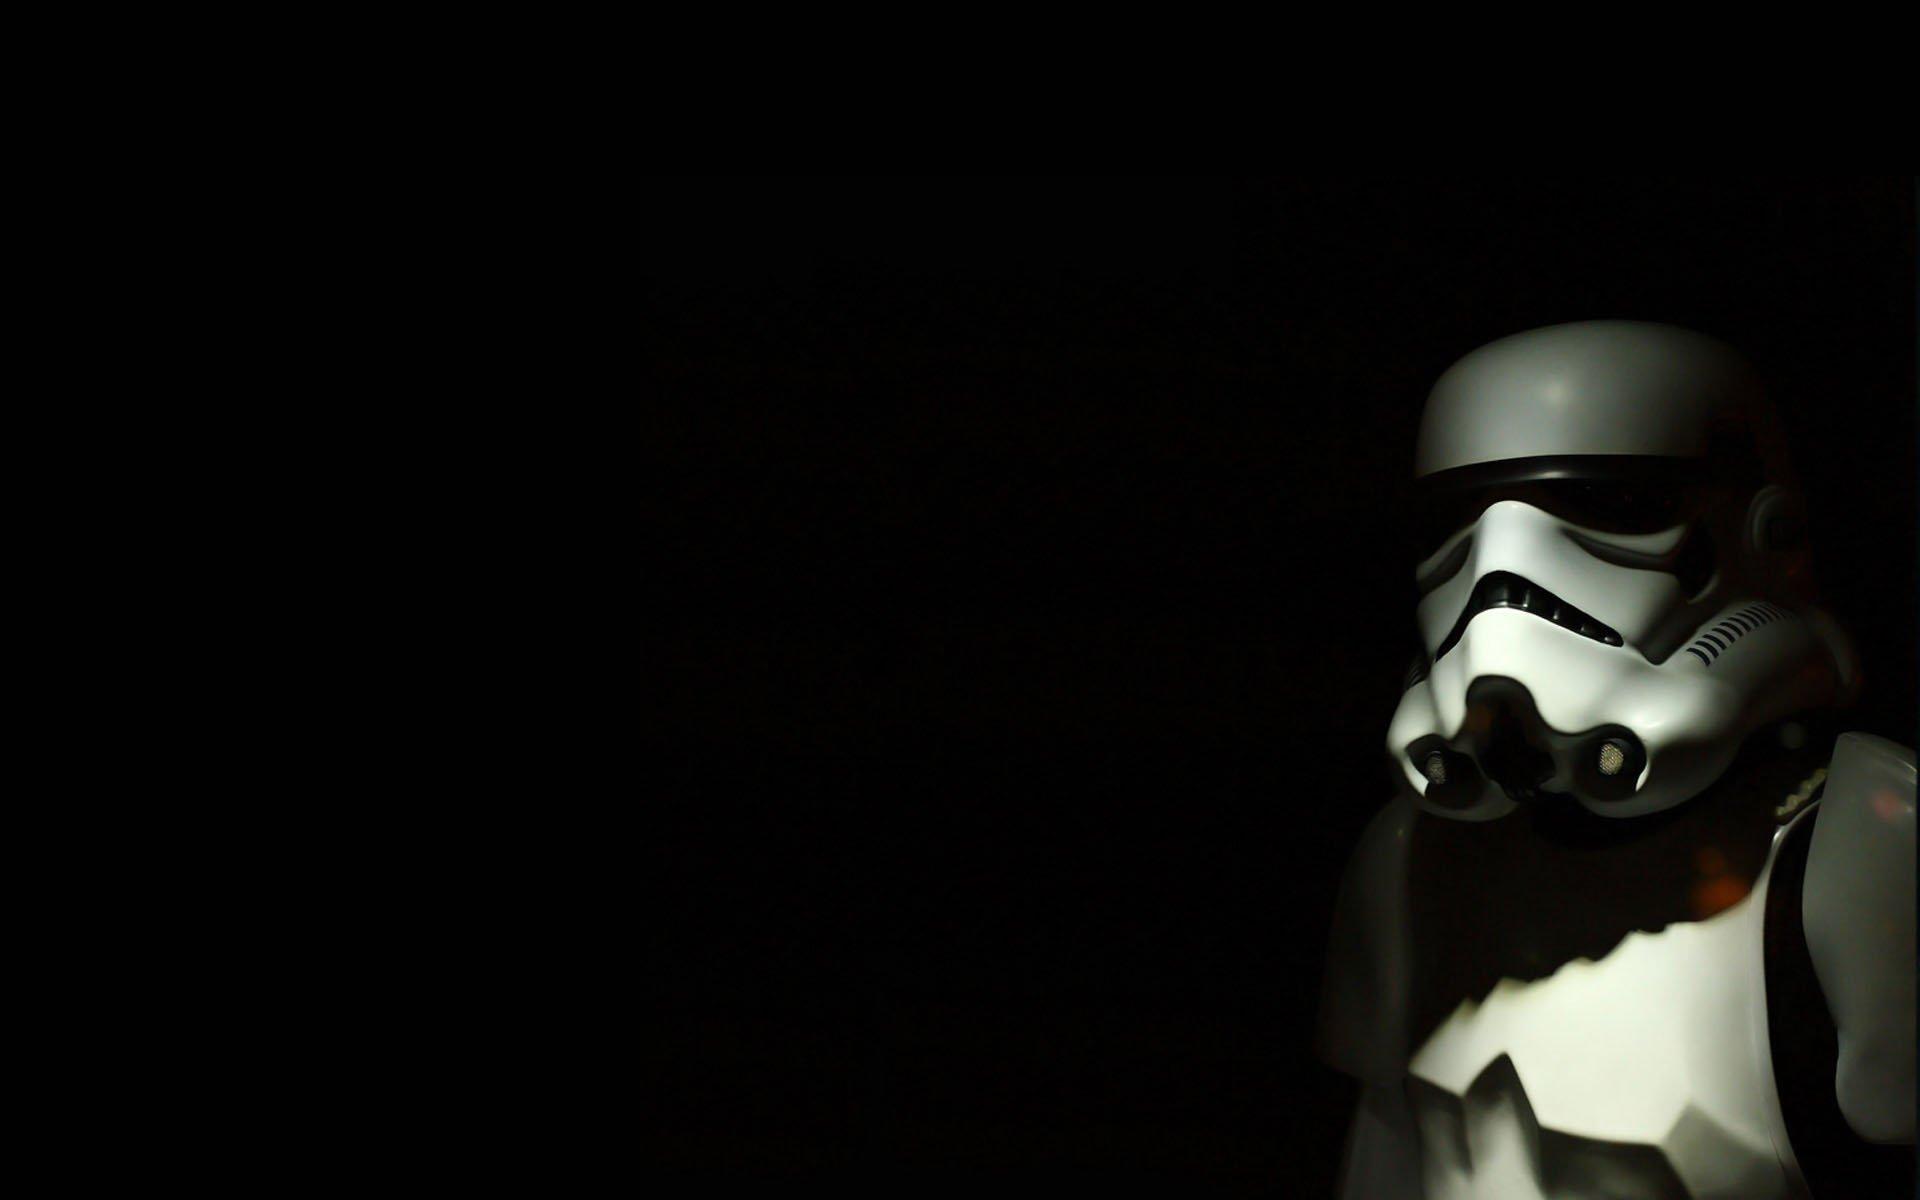 wars black stormtroopers simple background black background wallpaper